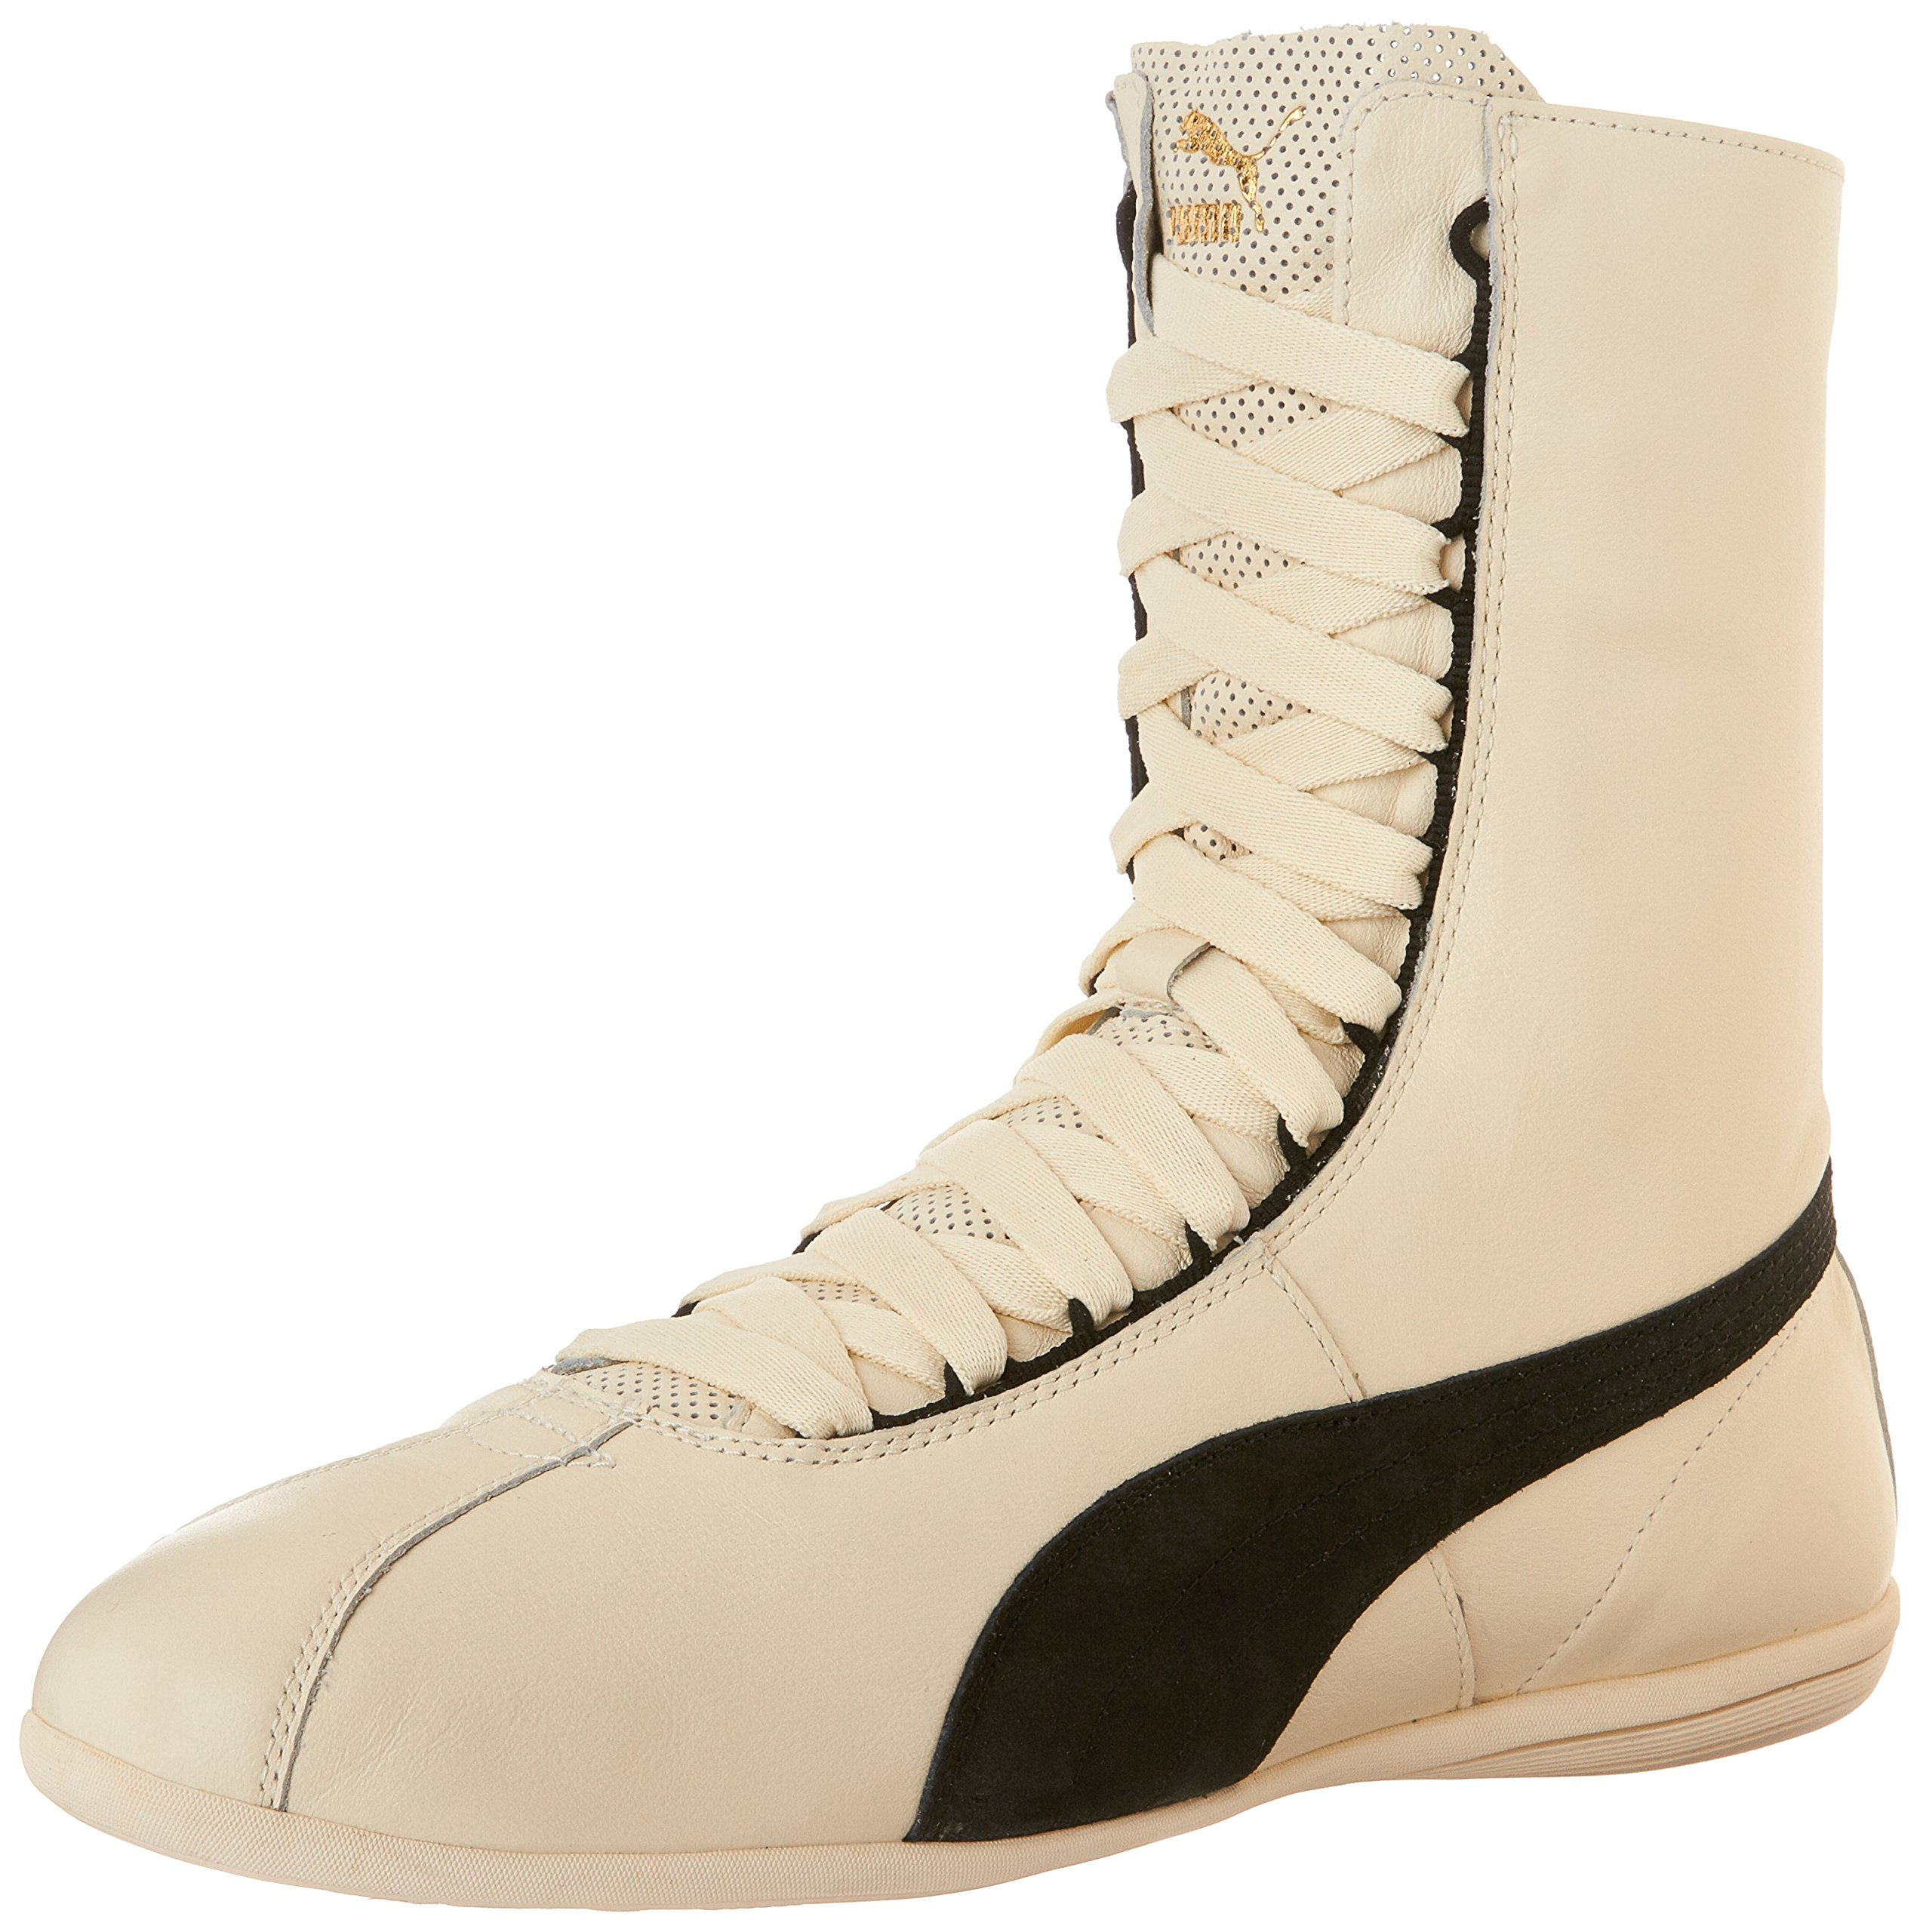 PUMA Women's Eskiva Hi Whisper White/Black High-Top Leather Cross Trainer Shoe - 9.5M